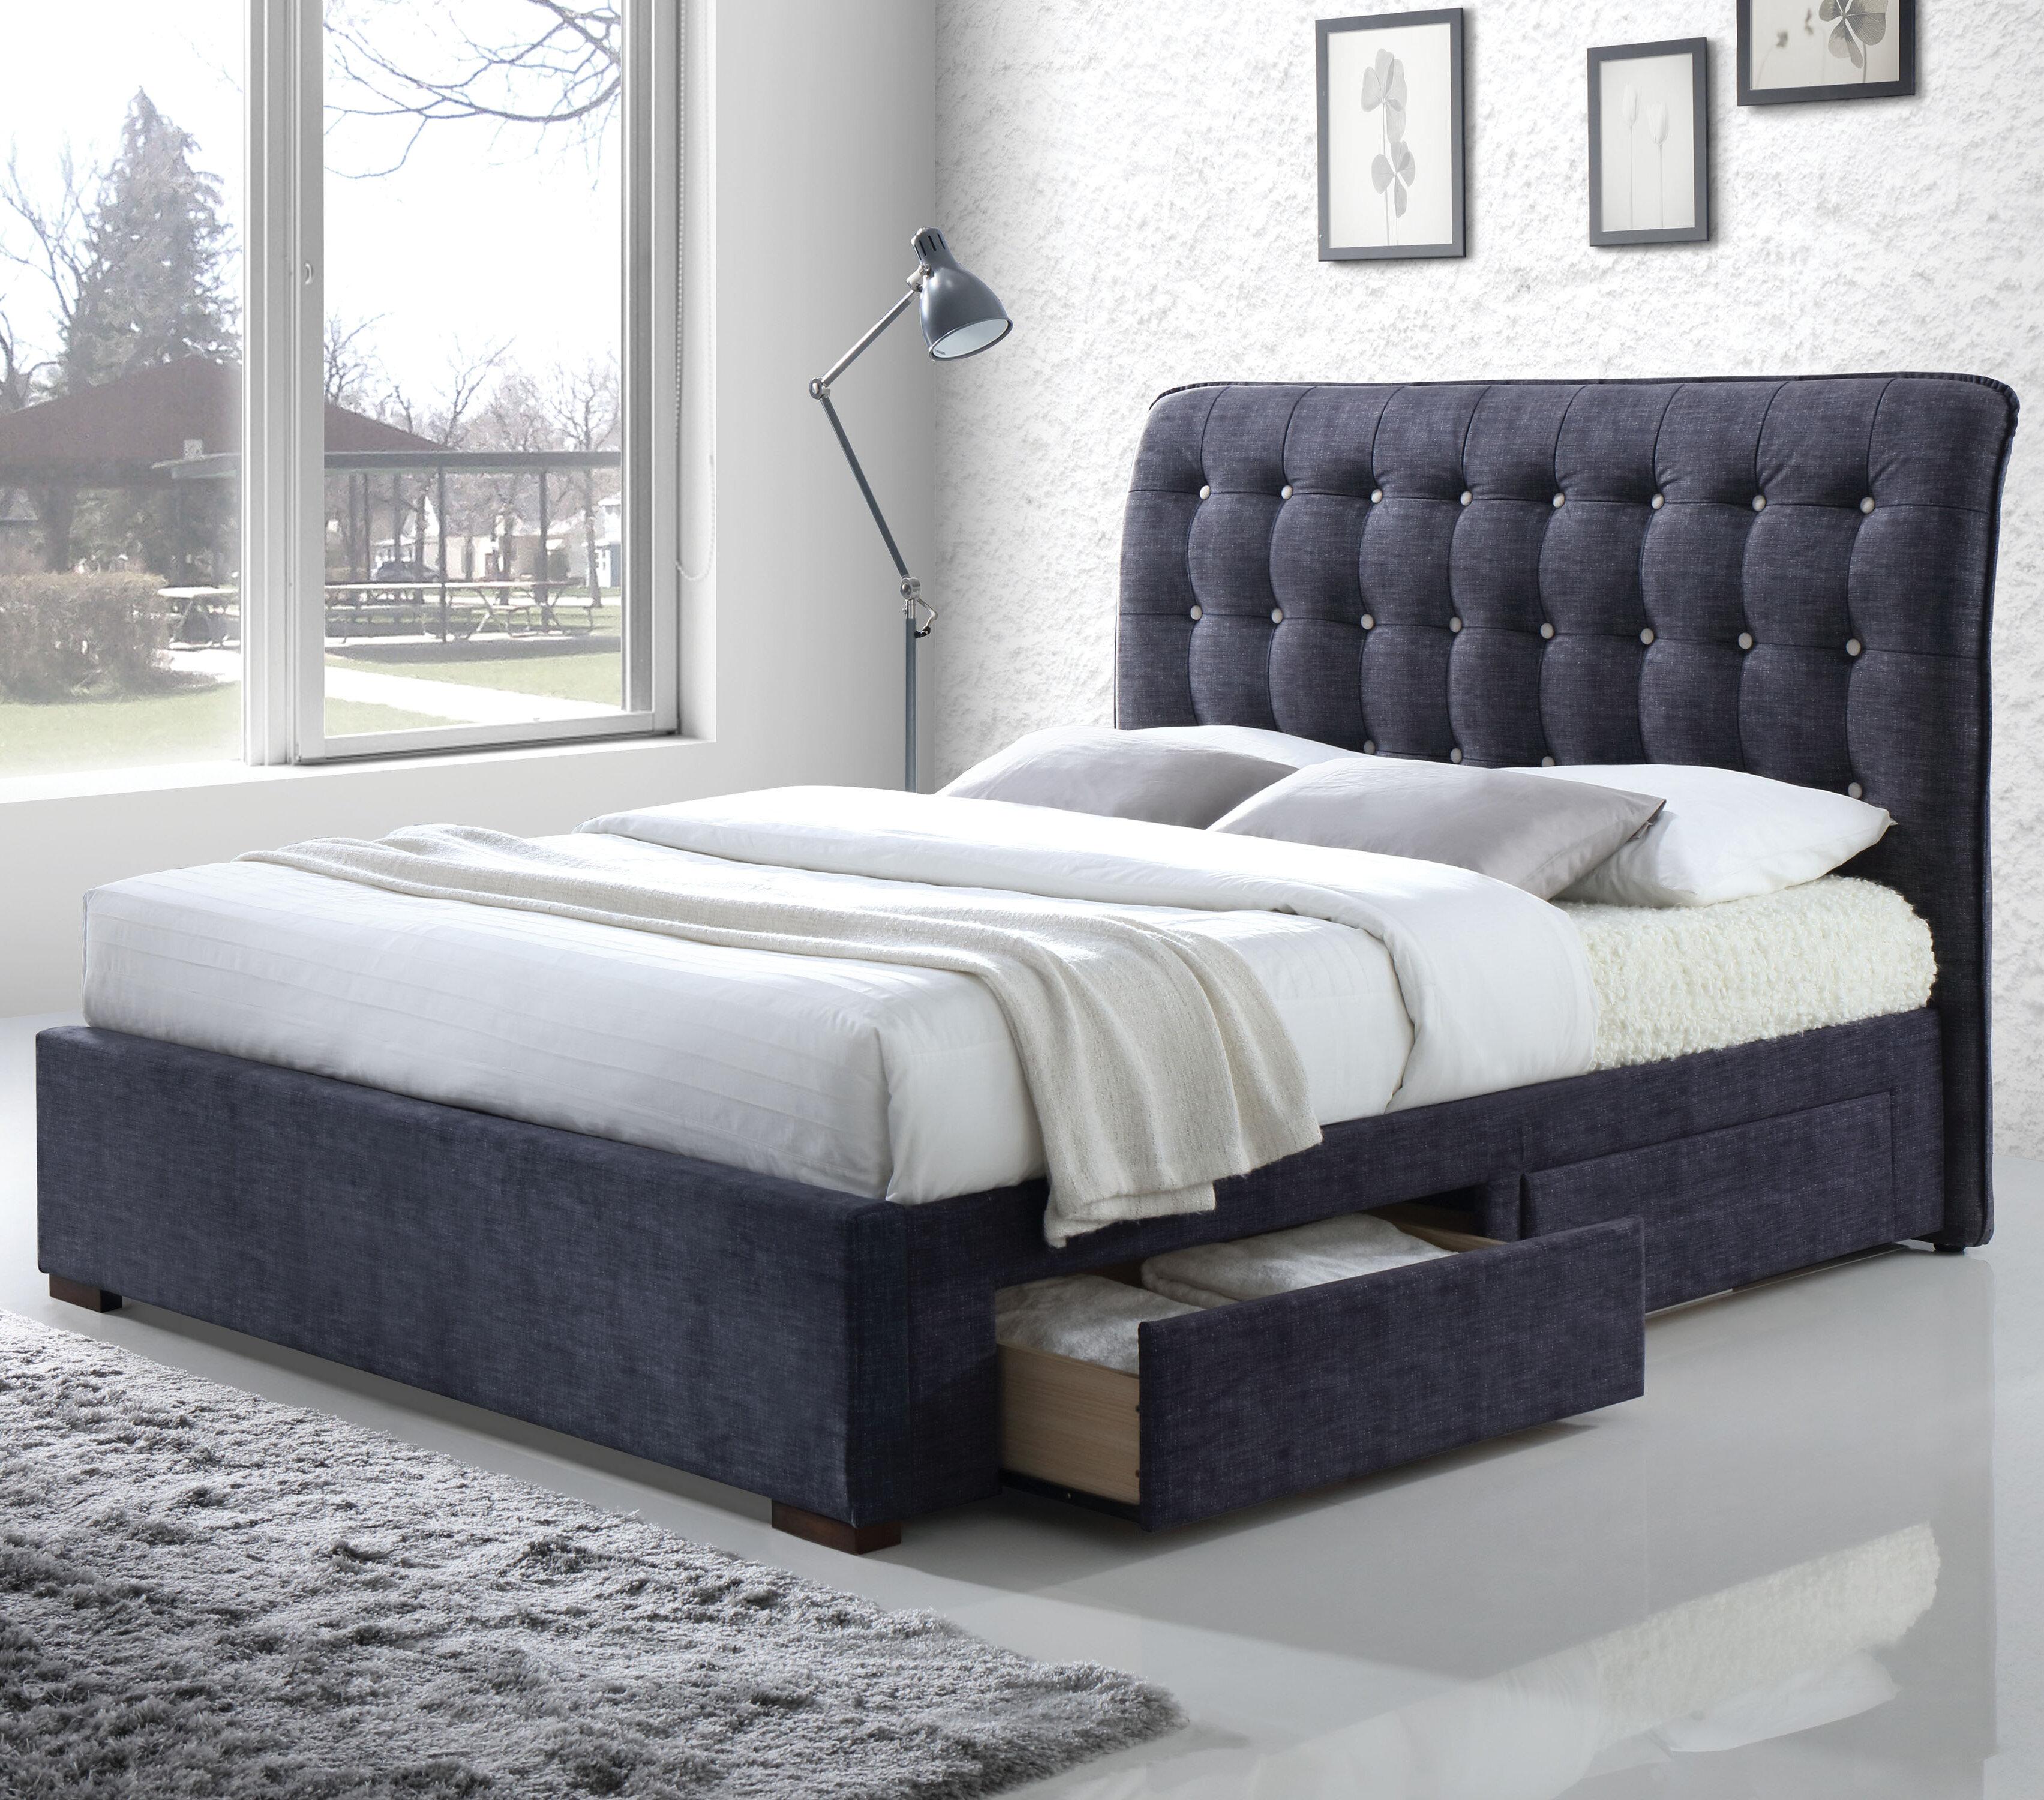 Brayden Studio Finn Upholstered Storage Sleigh Bed   Wayfair